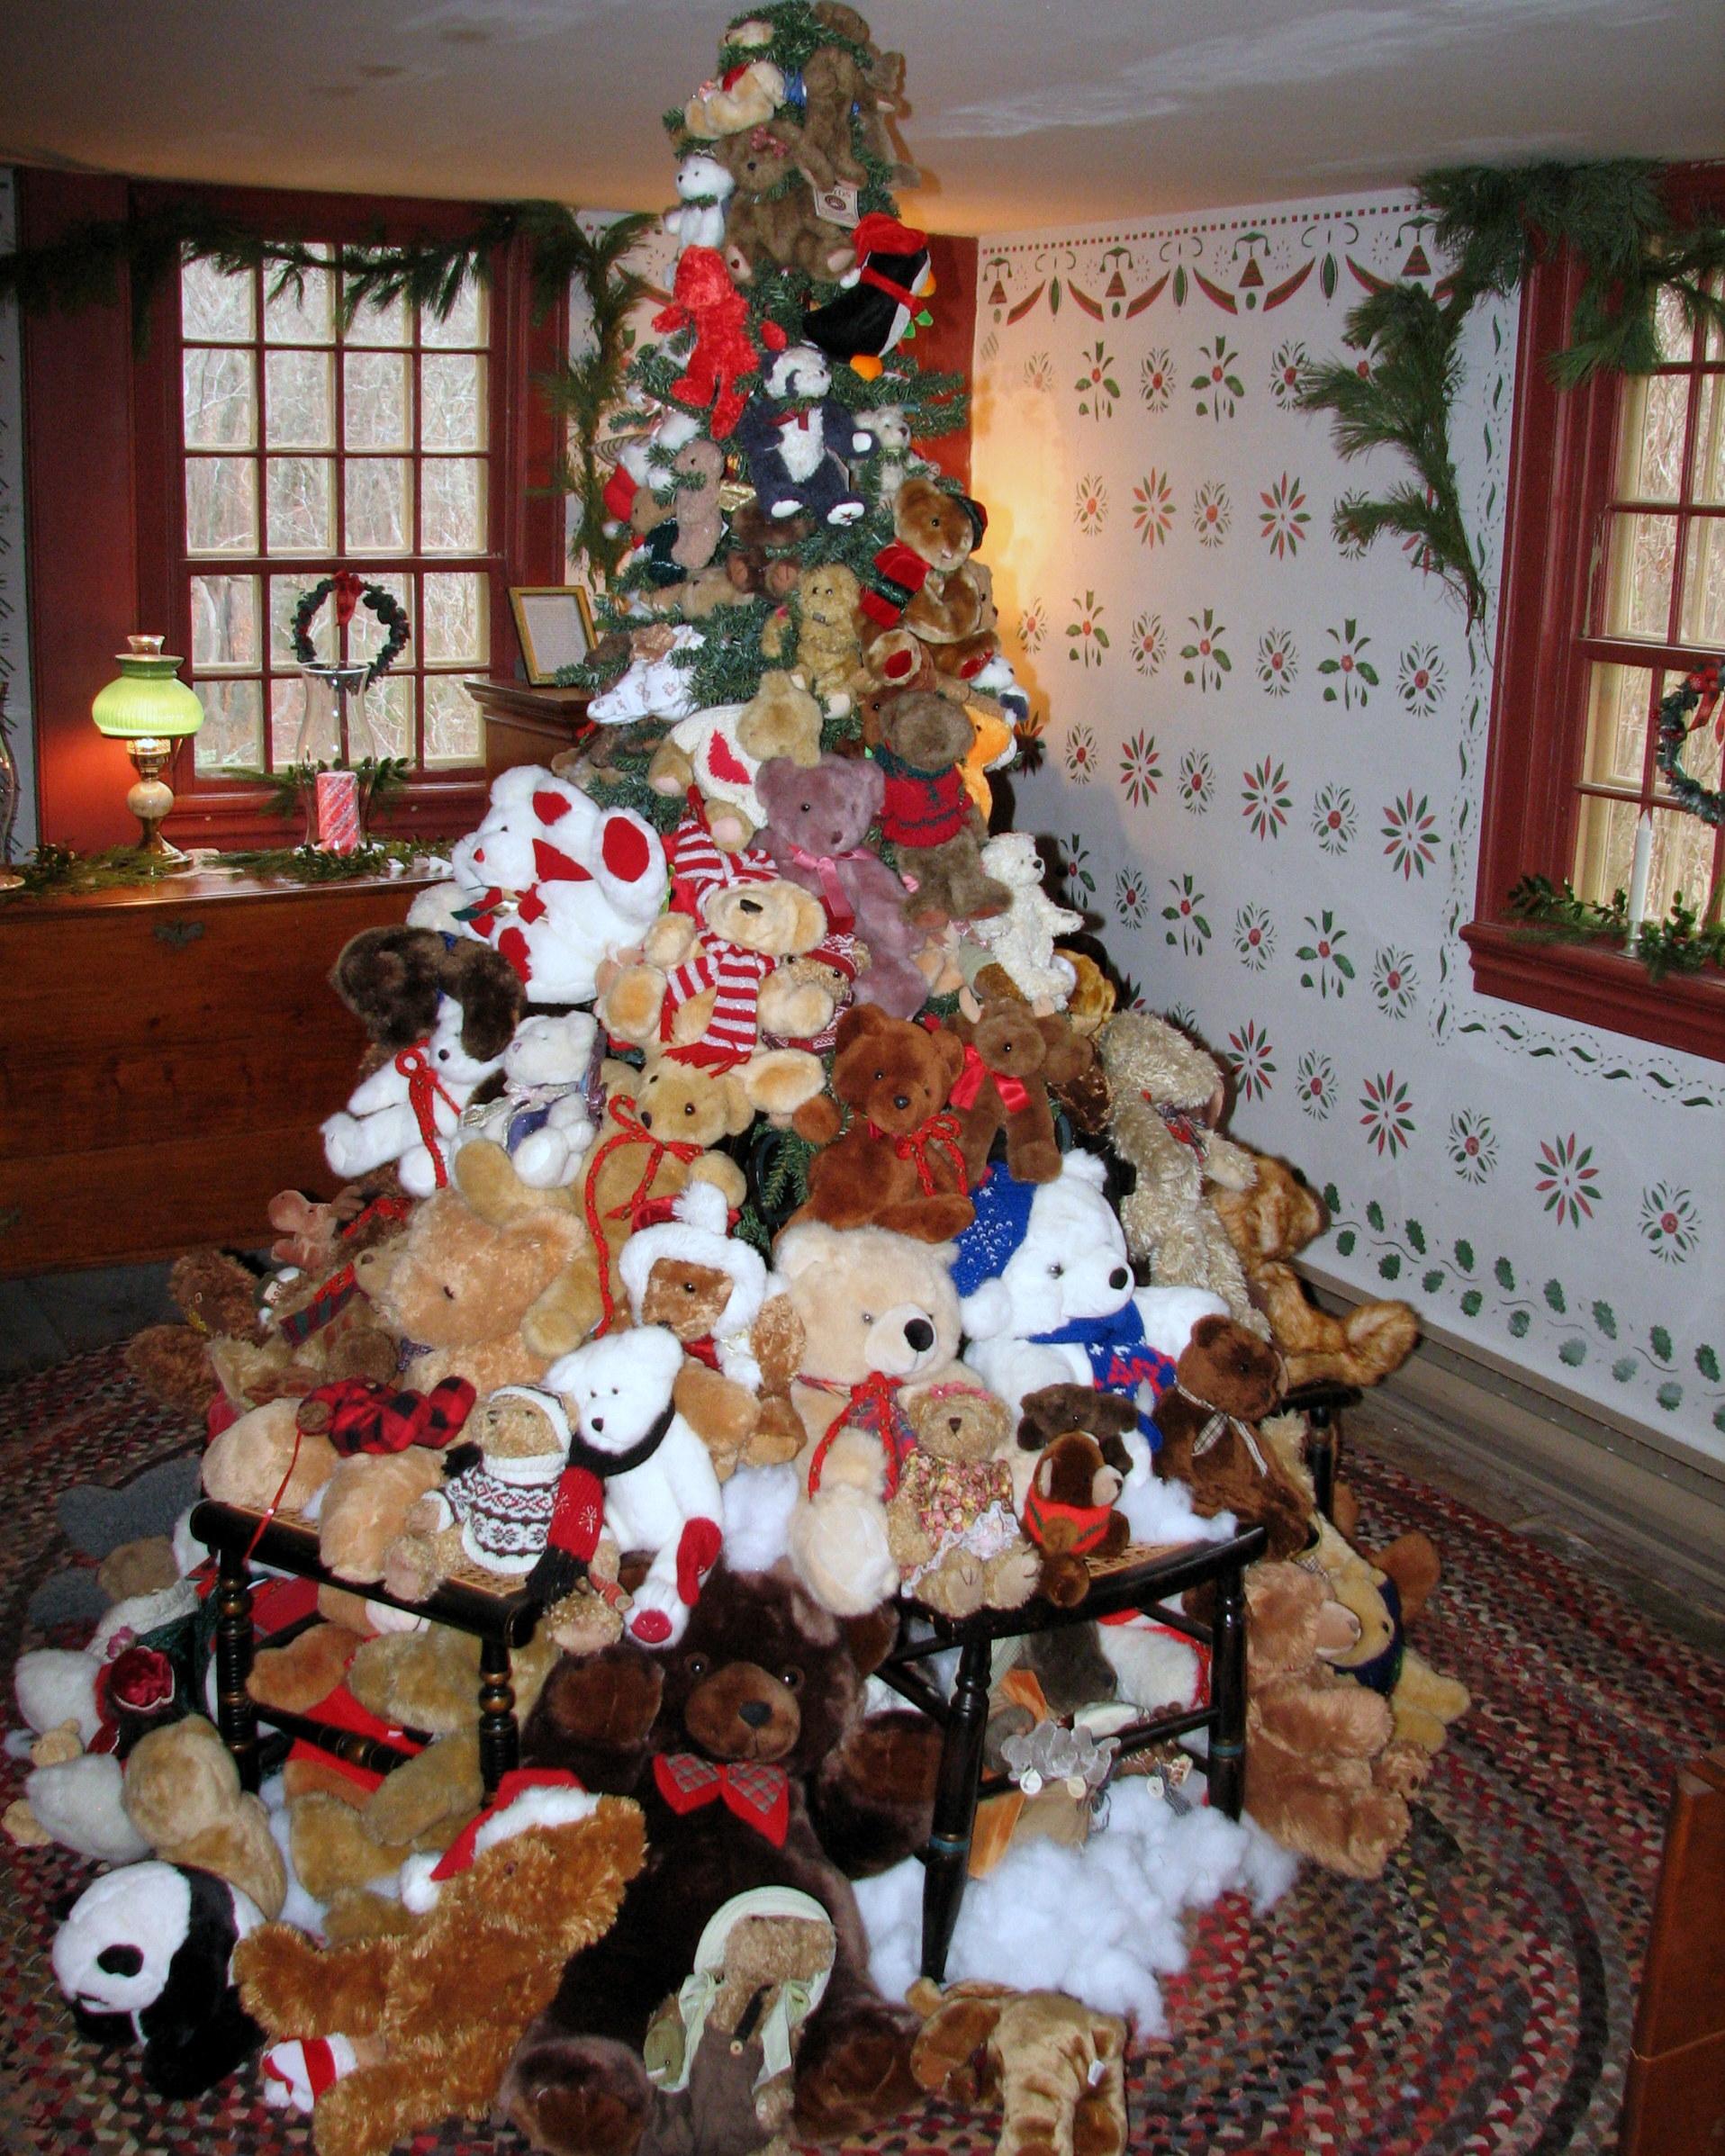 the teddy bear christmas tree - Bear Christmas Tree